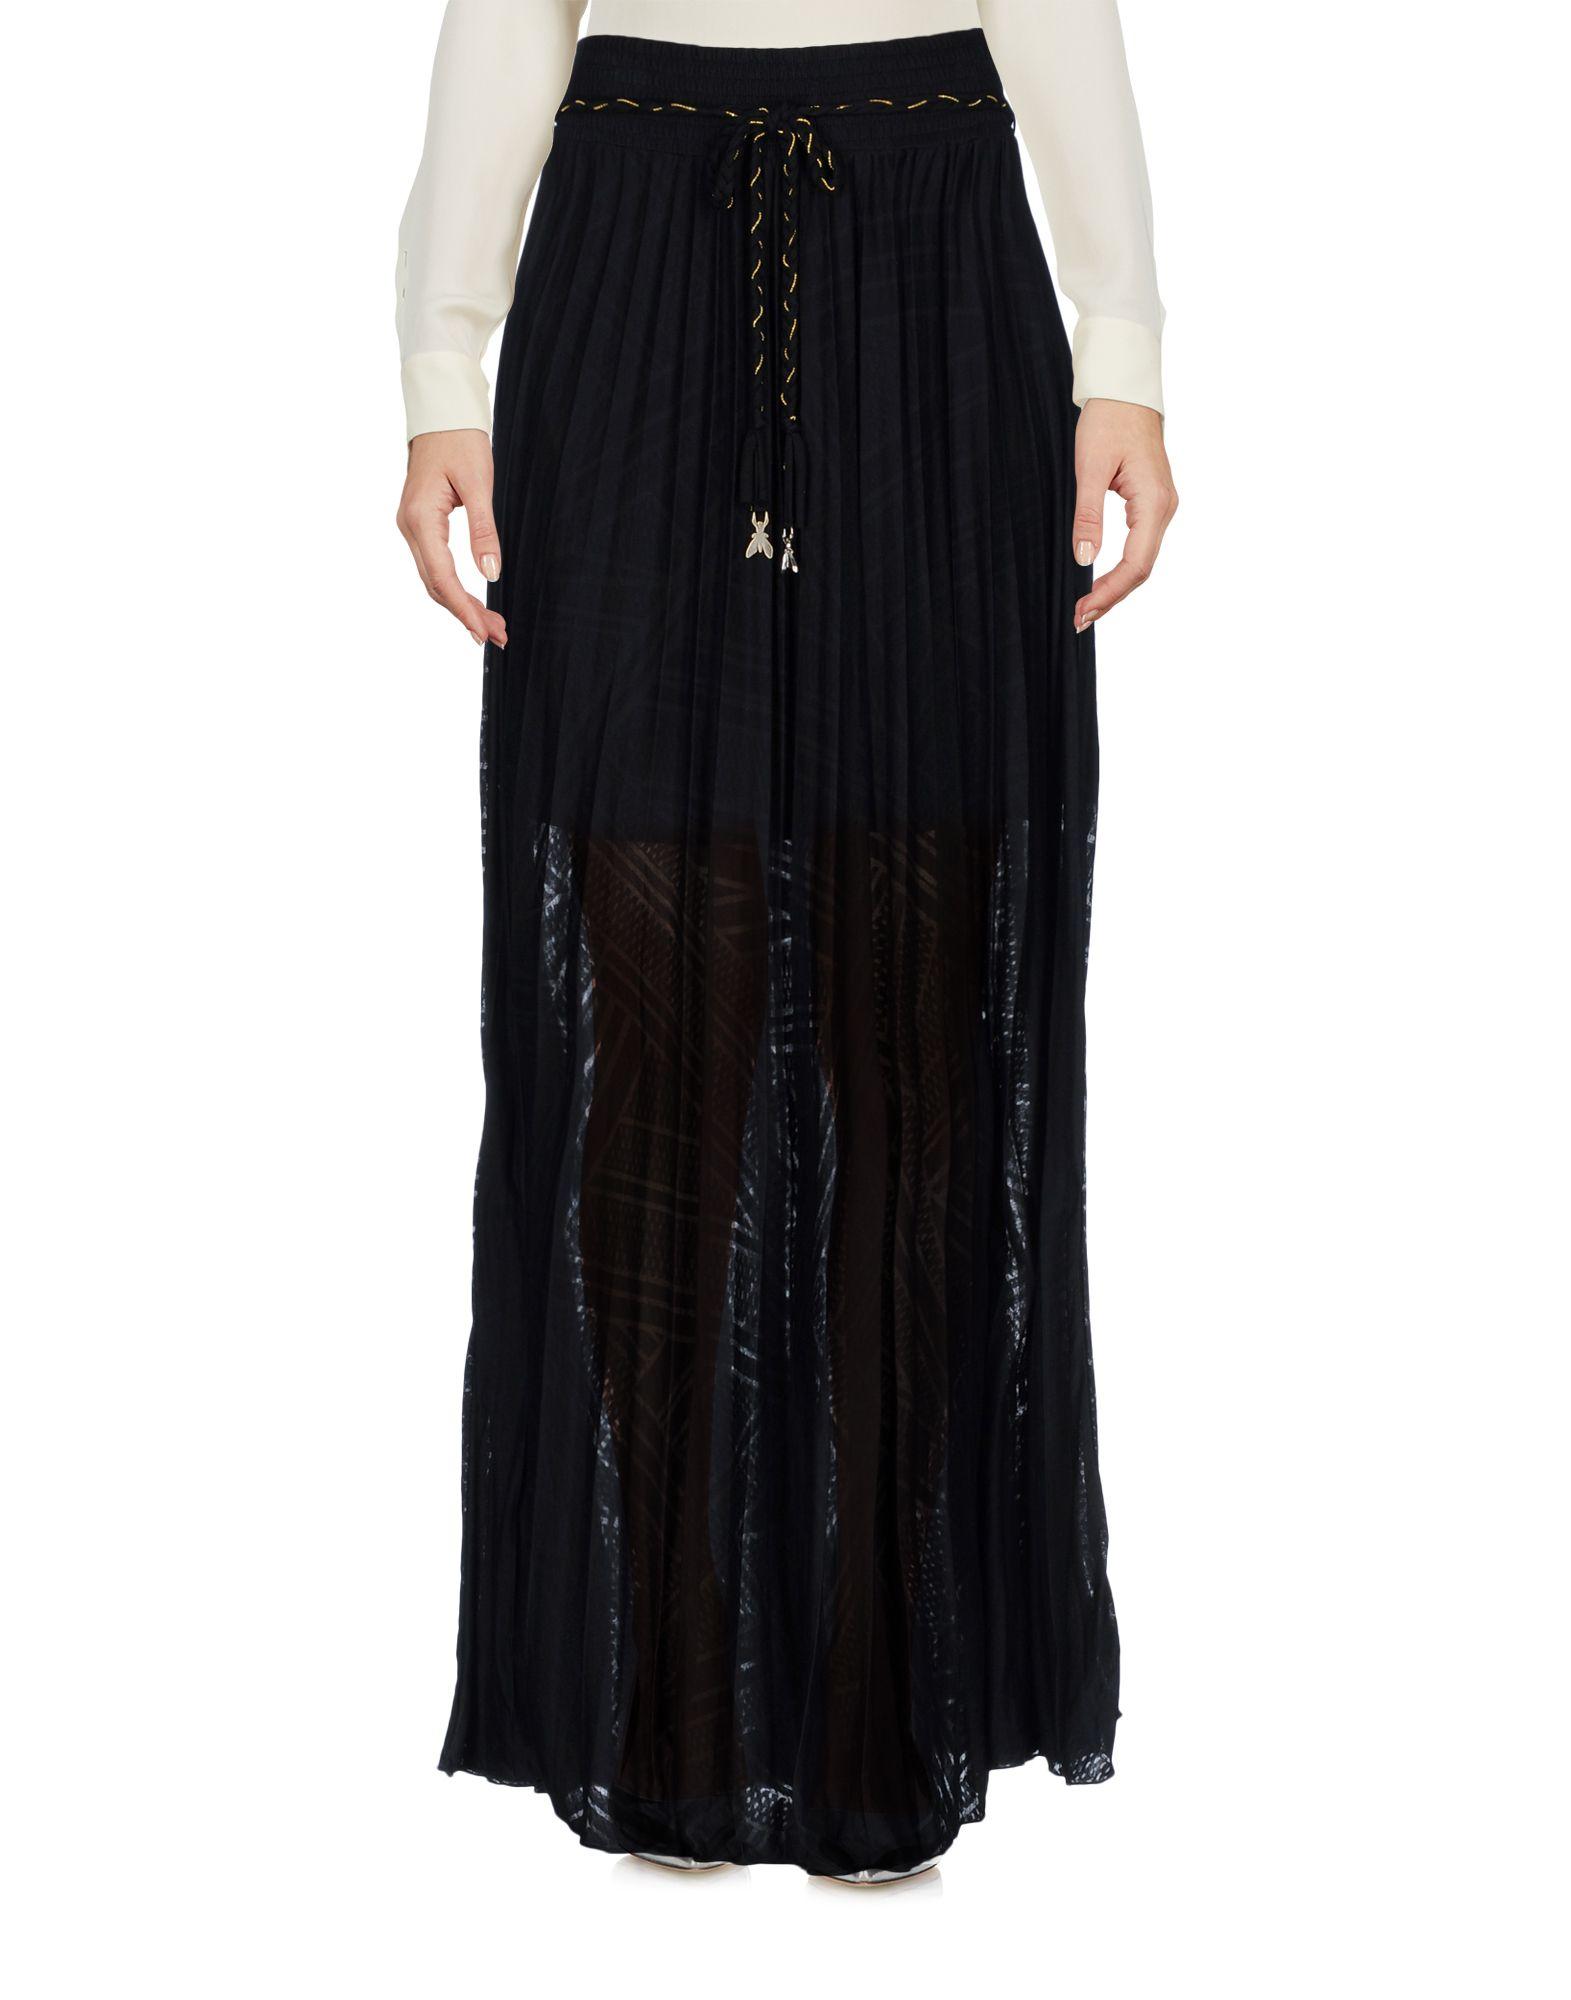 PATRIZIA PEPE Длинная юбка юбка patrizia pepe юбка